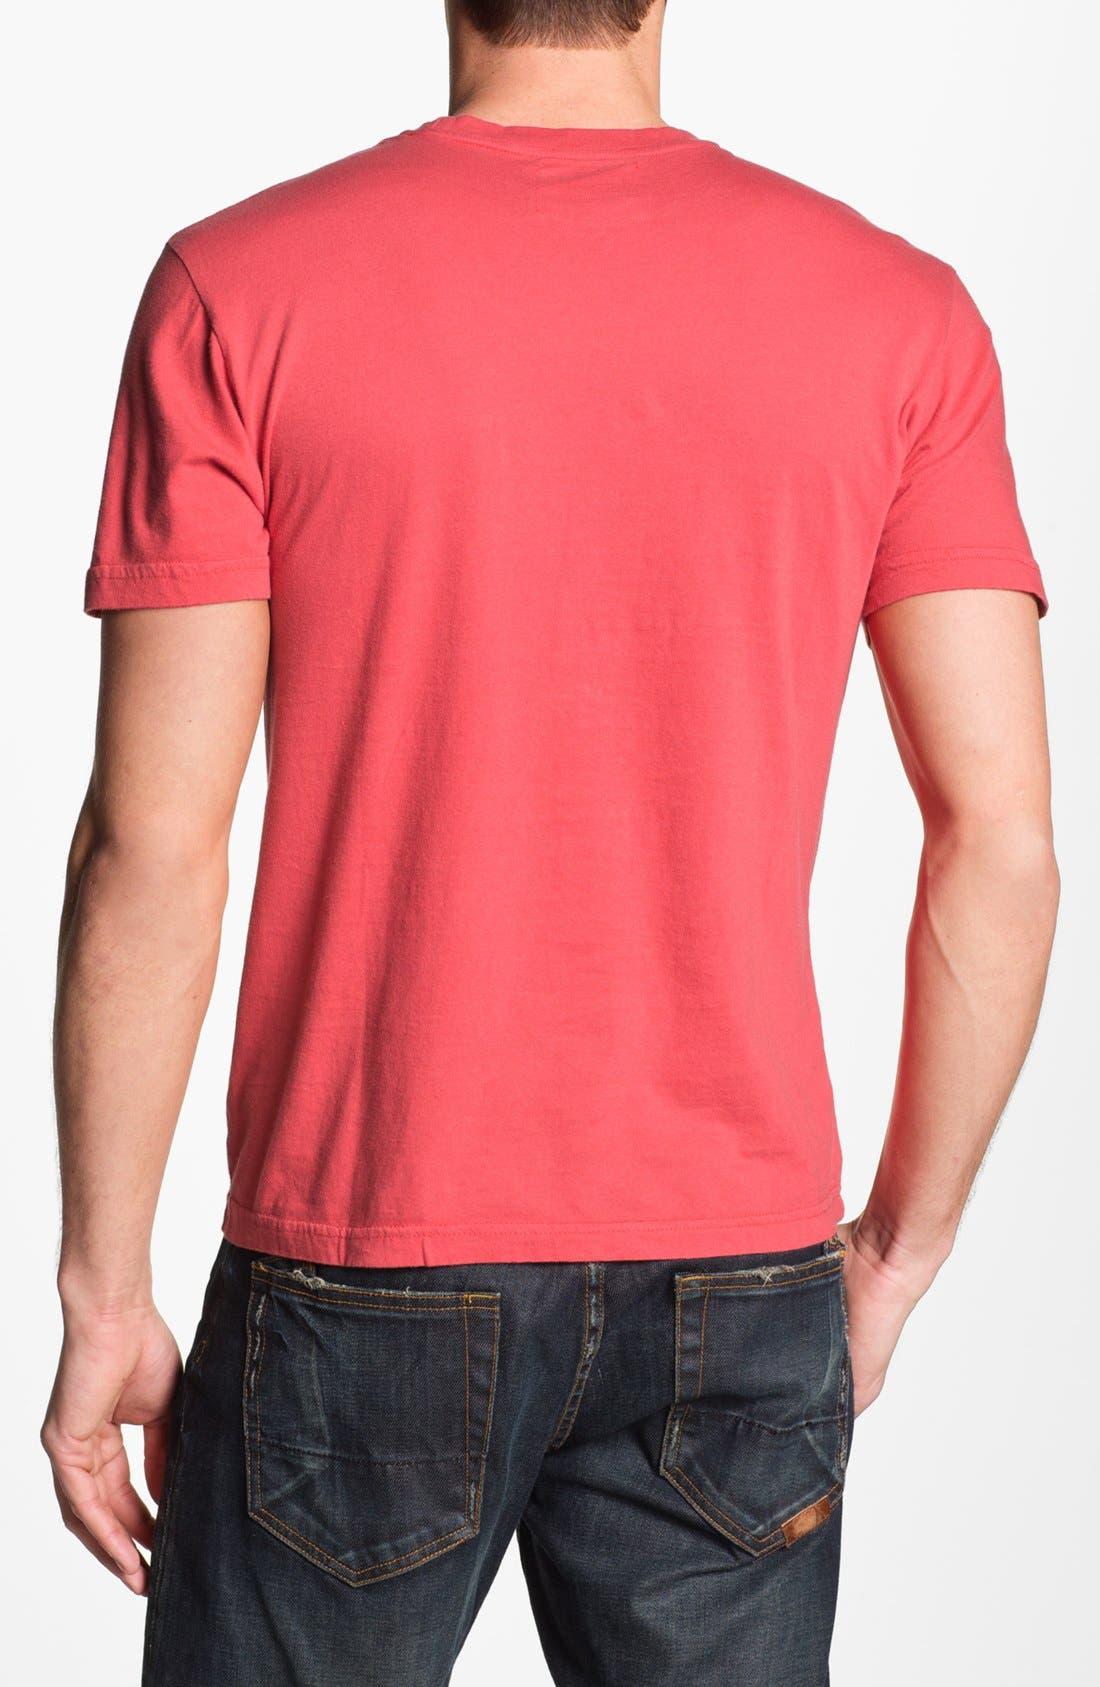 Alternate Image 2  - Red Jacket 'Washington Nationals' Trim Fit T-Shirt (Men)